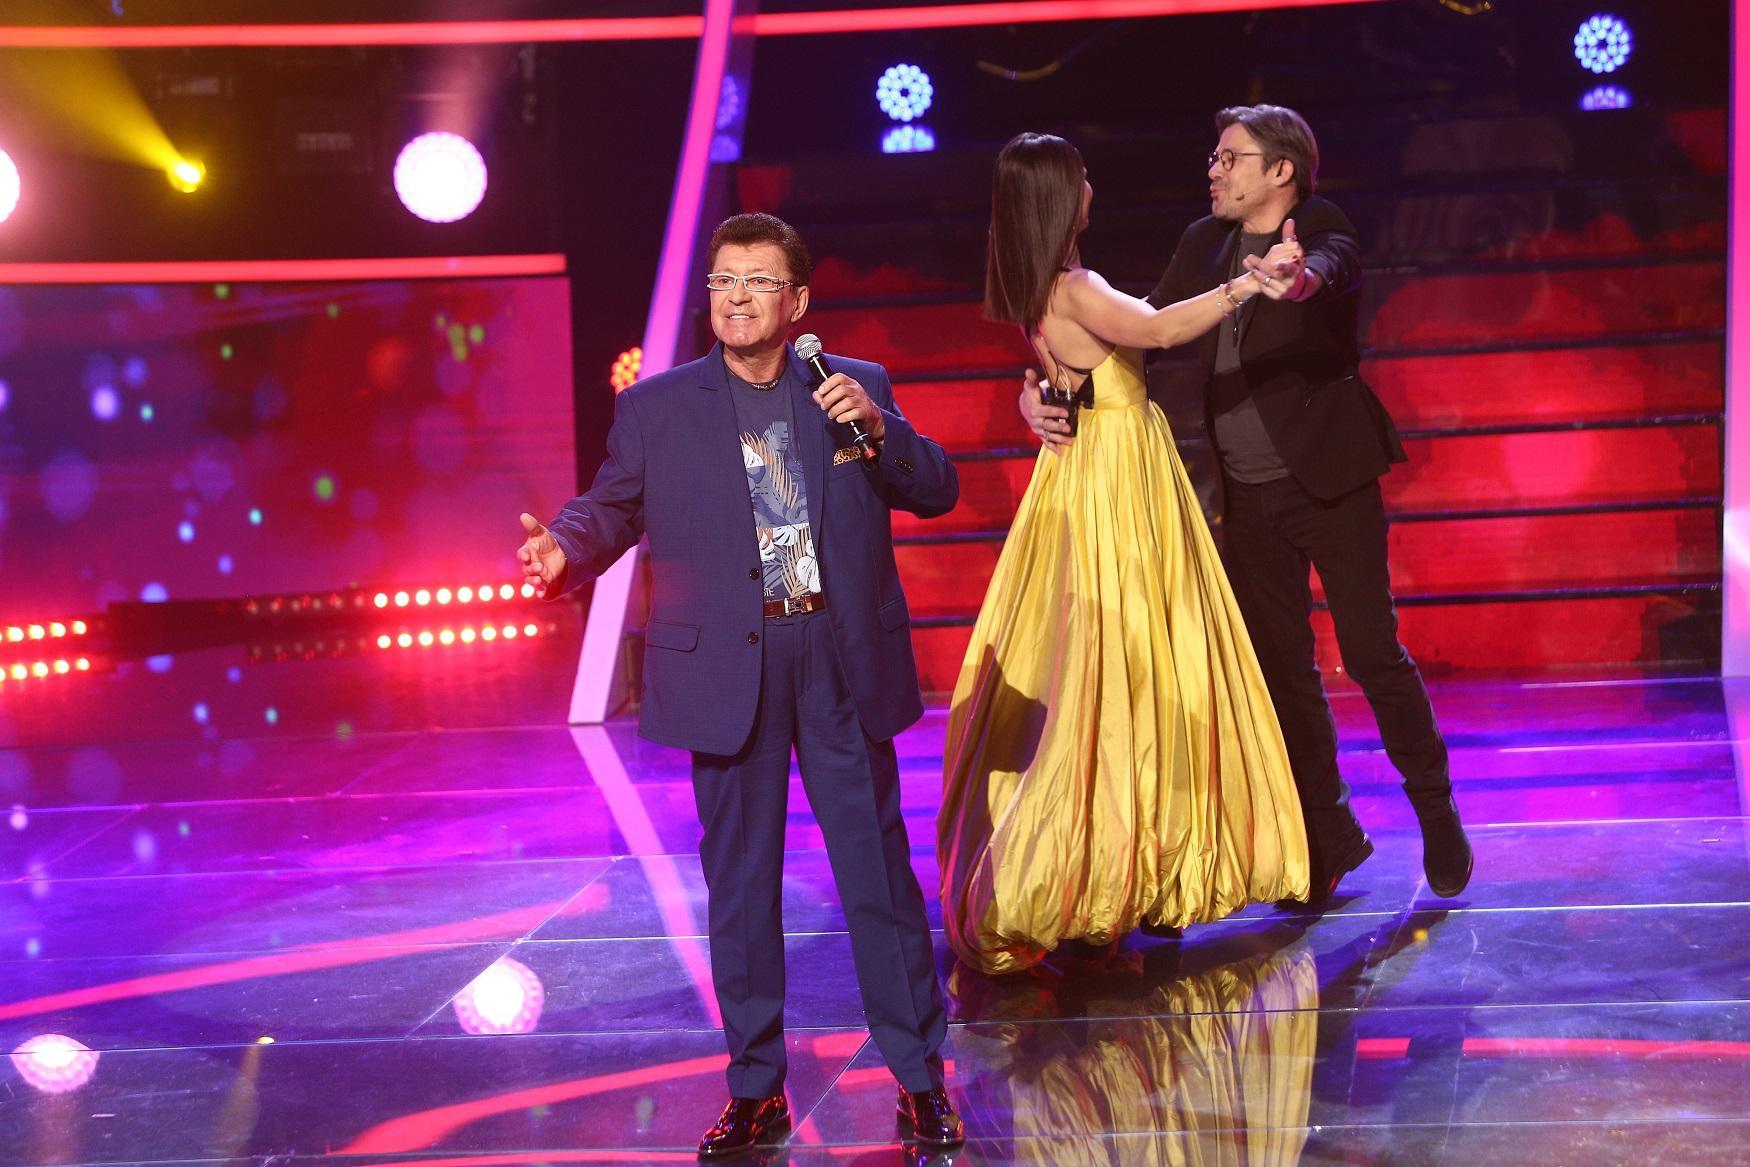 Sâmbătă, de la 20:00, la Antena 1, Gabriel Dorobanţu, invitat special la Te cunosc de undeva!